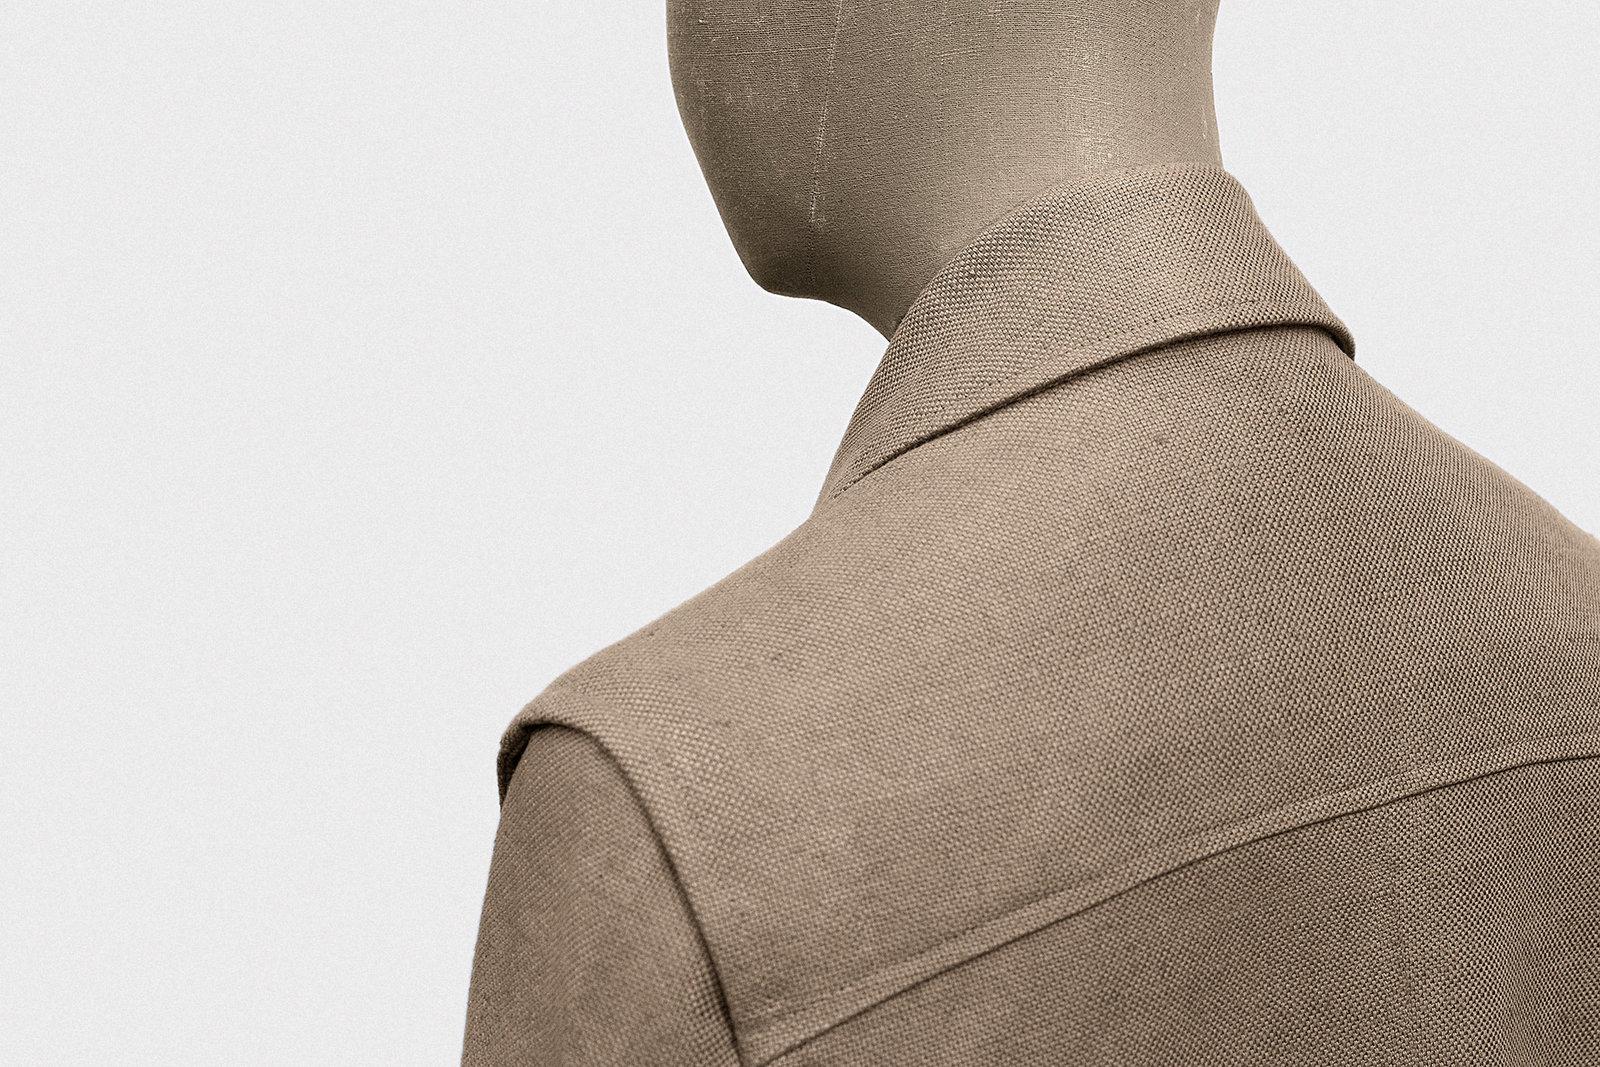 shopcoat-cotton-linen-hopsack-malt-10@2x.jpg